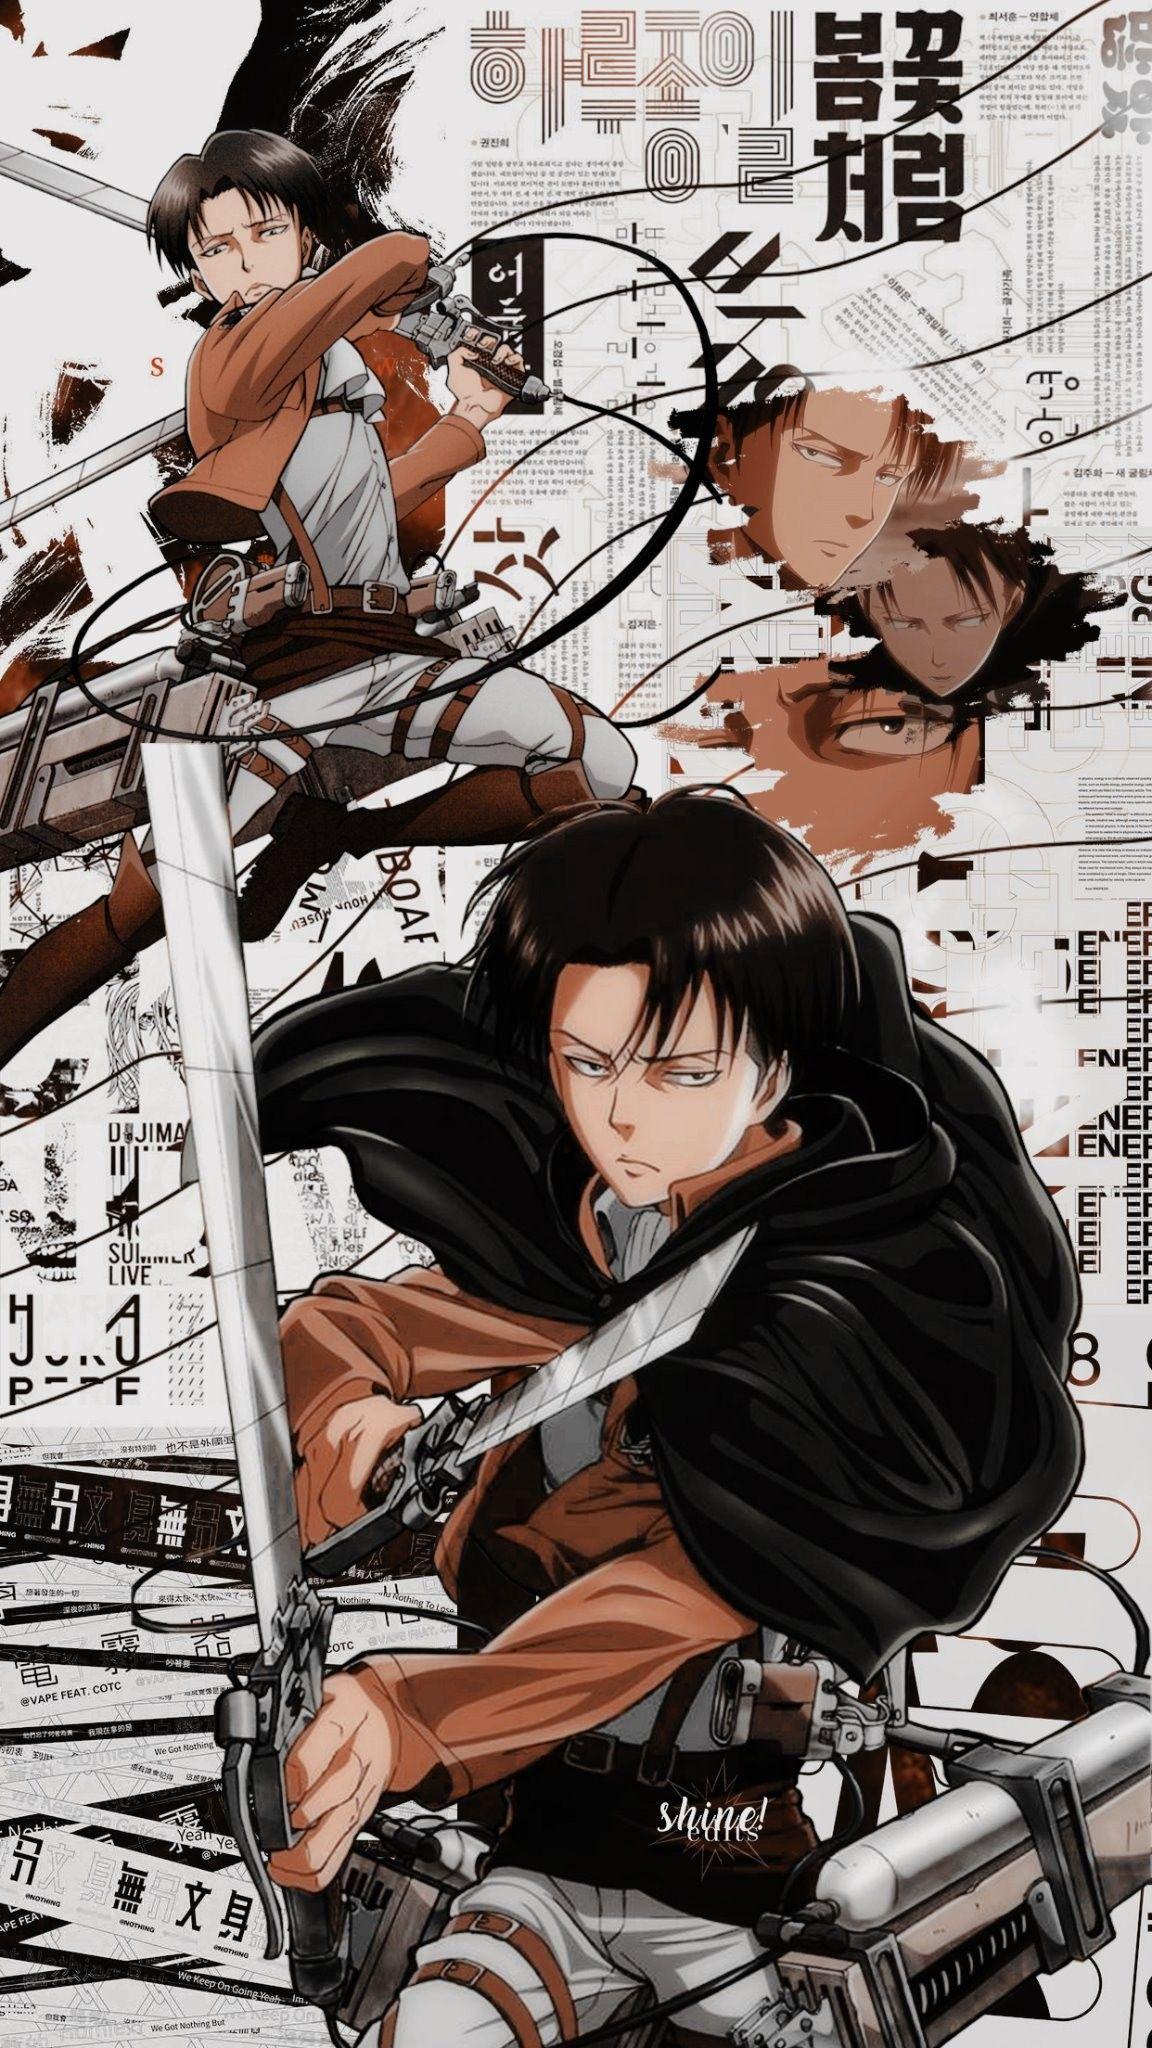 Levi Lockscreen Shingeki No Kyojin Shinedlts On Twitter If You Use Something Give Credit Attack On Titan Anime Attack On Titan Aesthetic Titans Anime